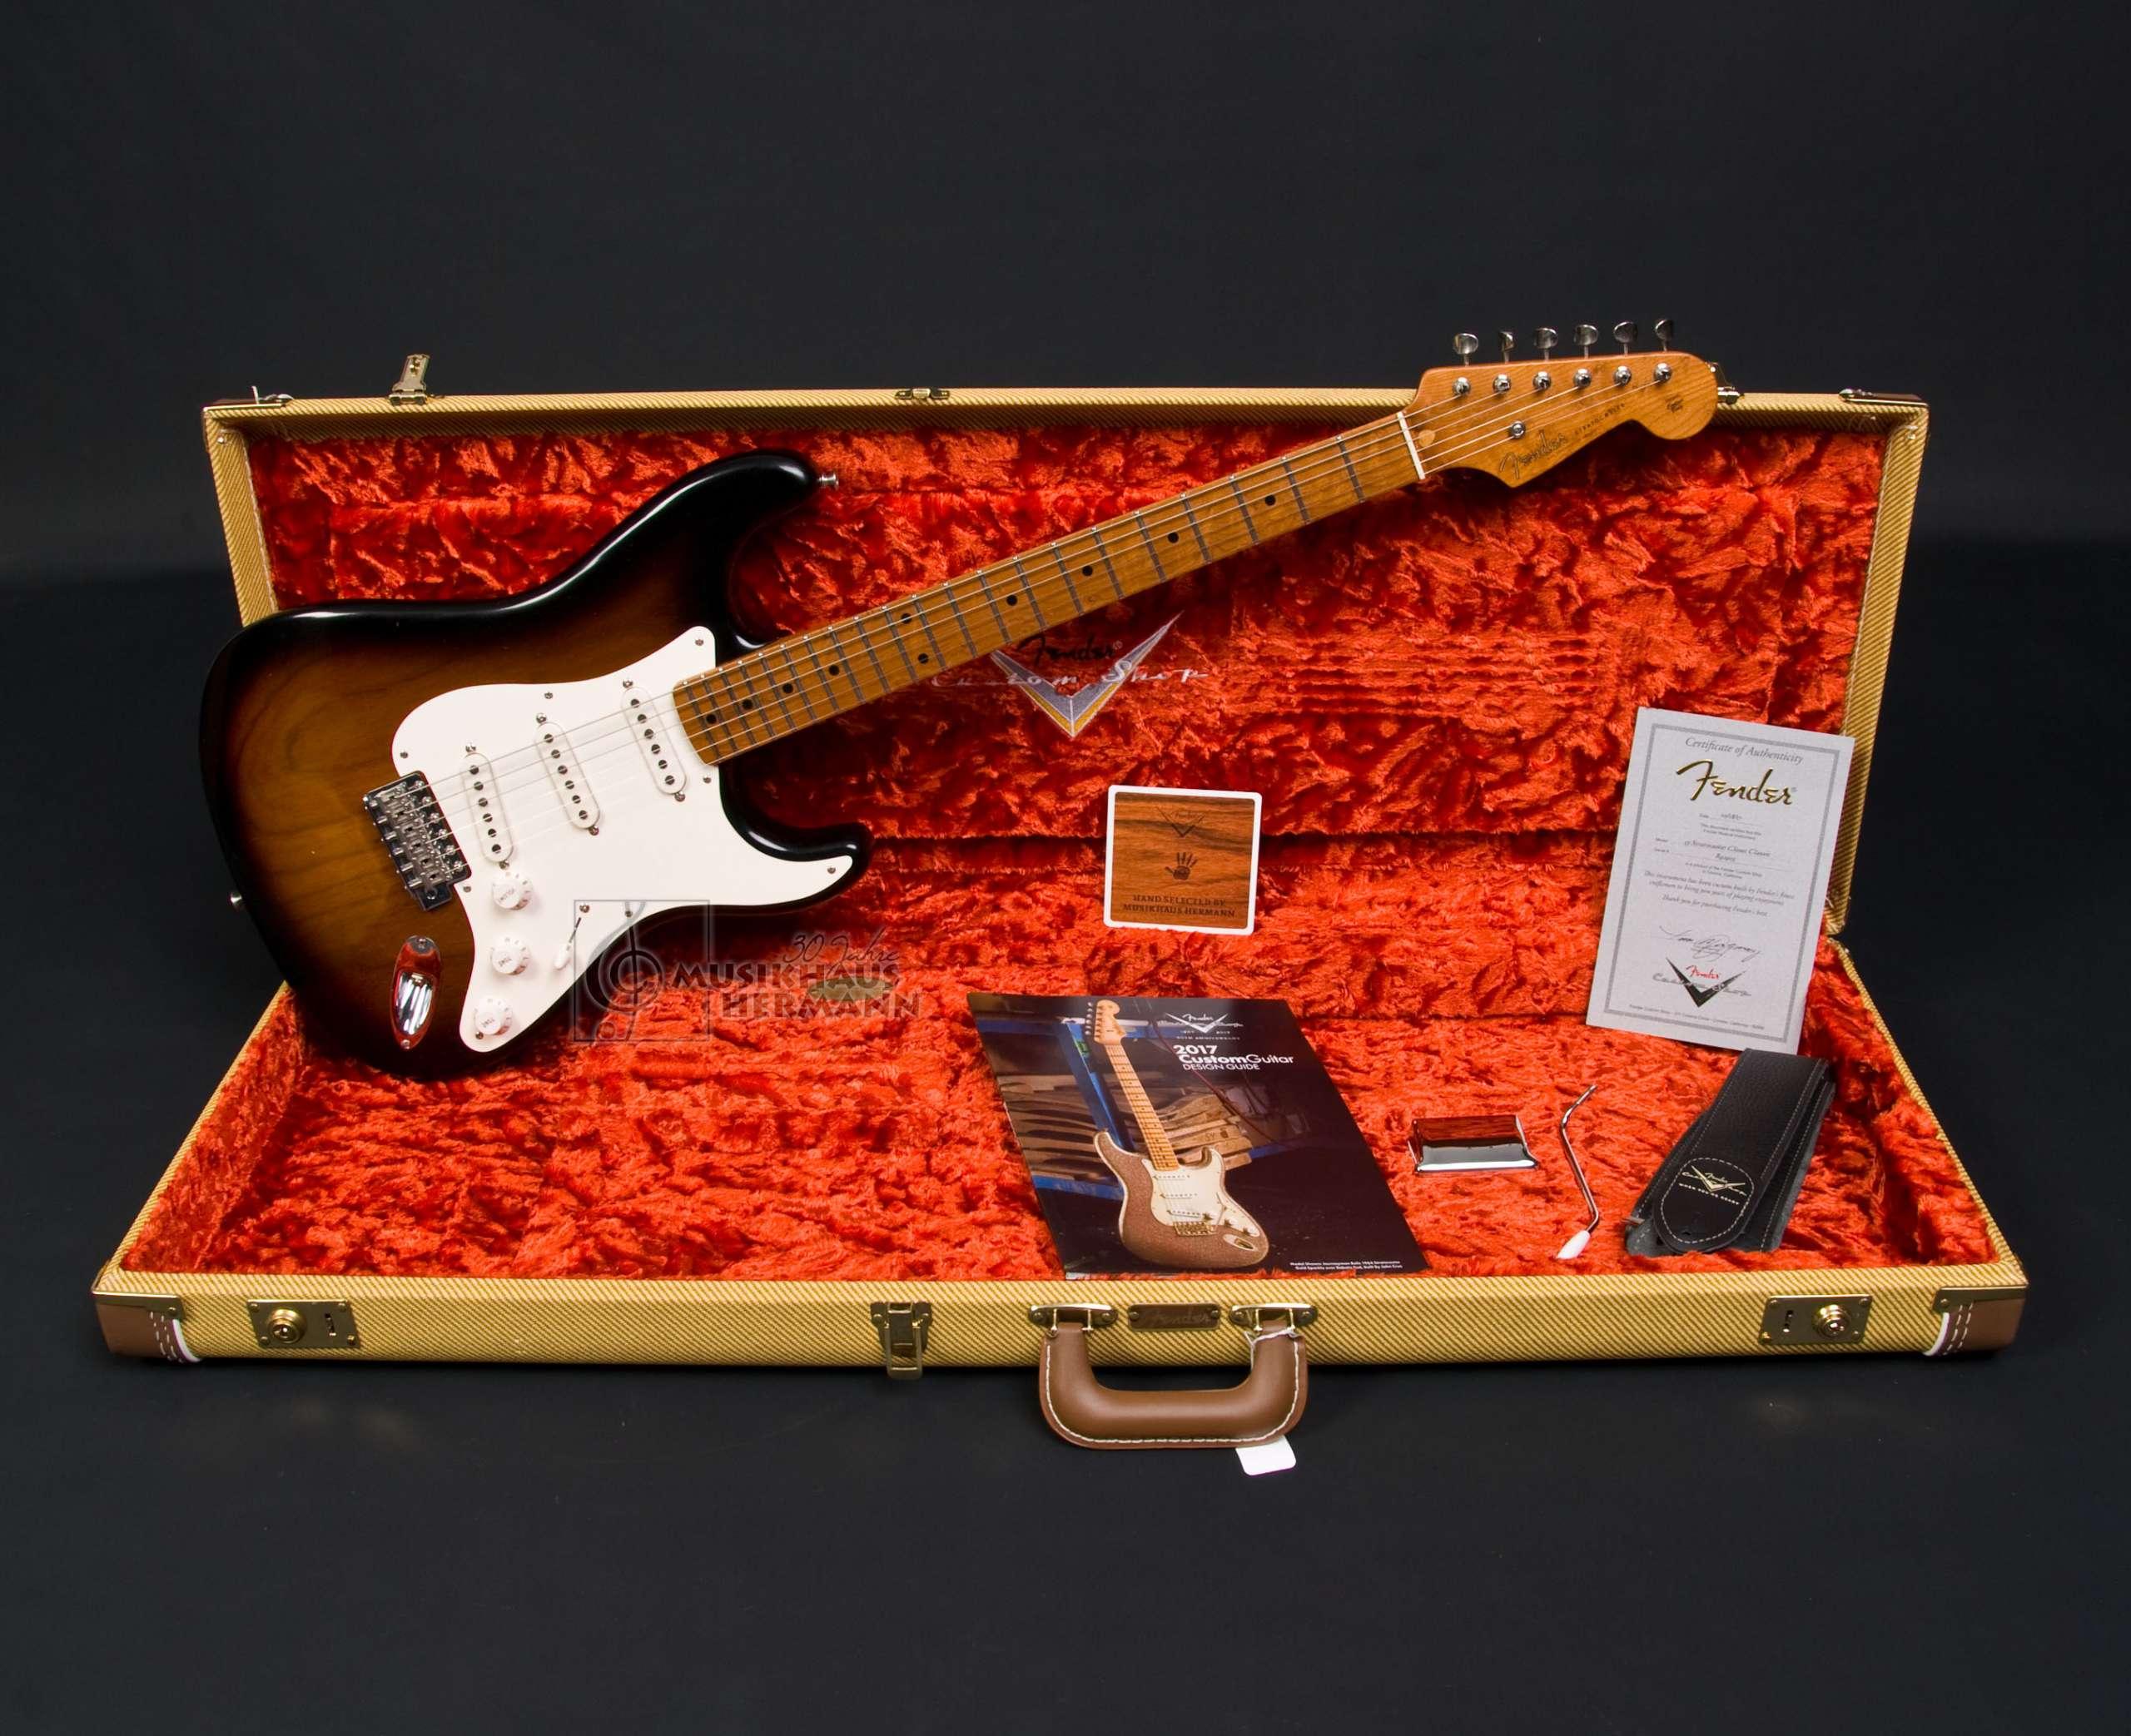 Atemberaubend Fender Strat Pickup Schaltplan 2002 Galerie ...